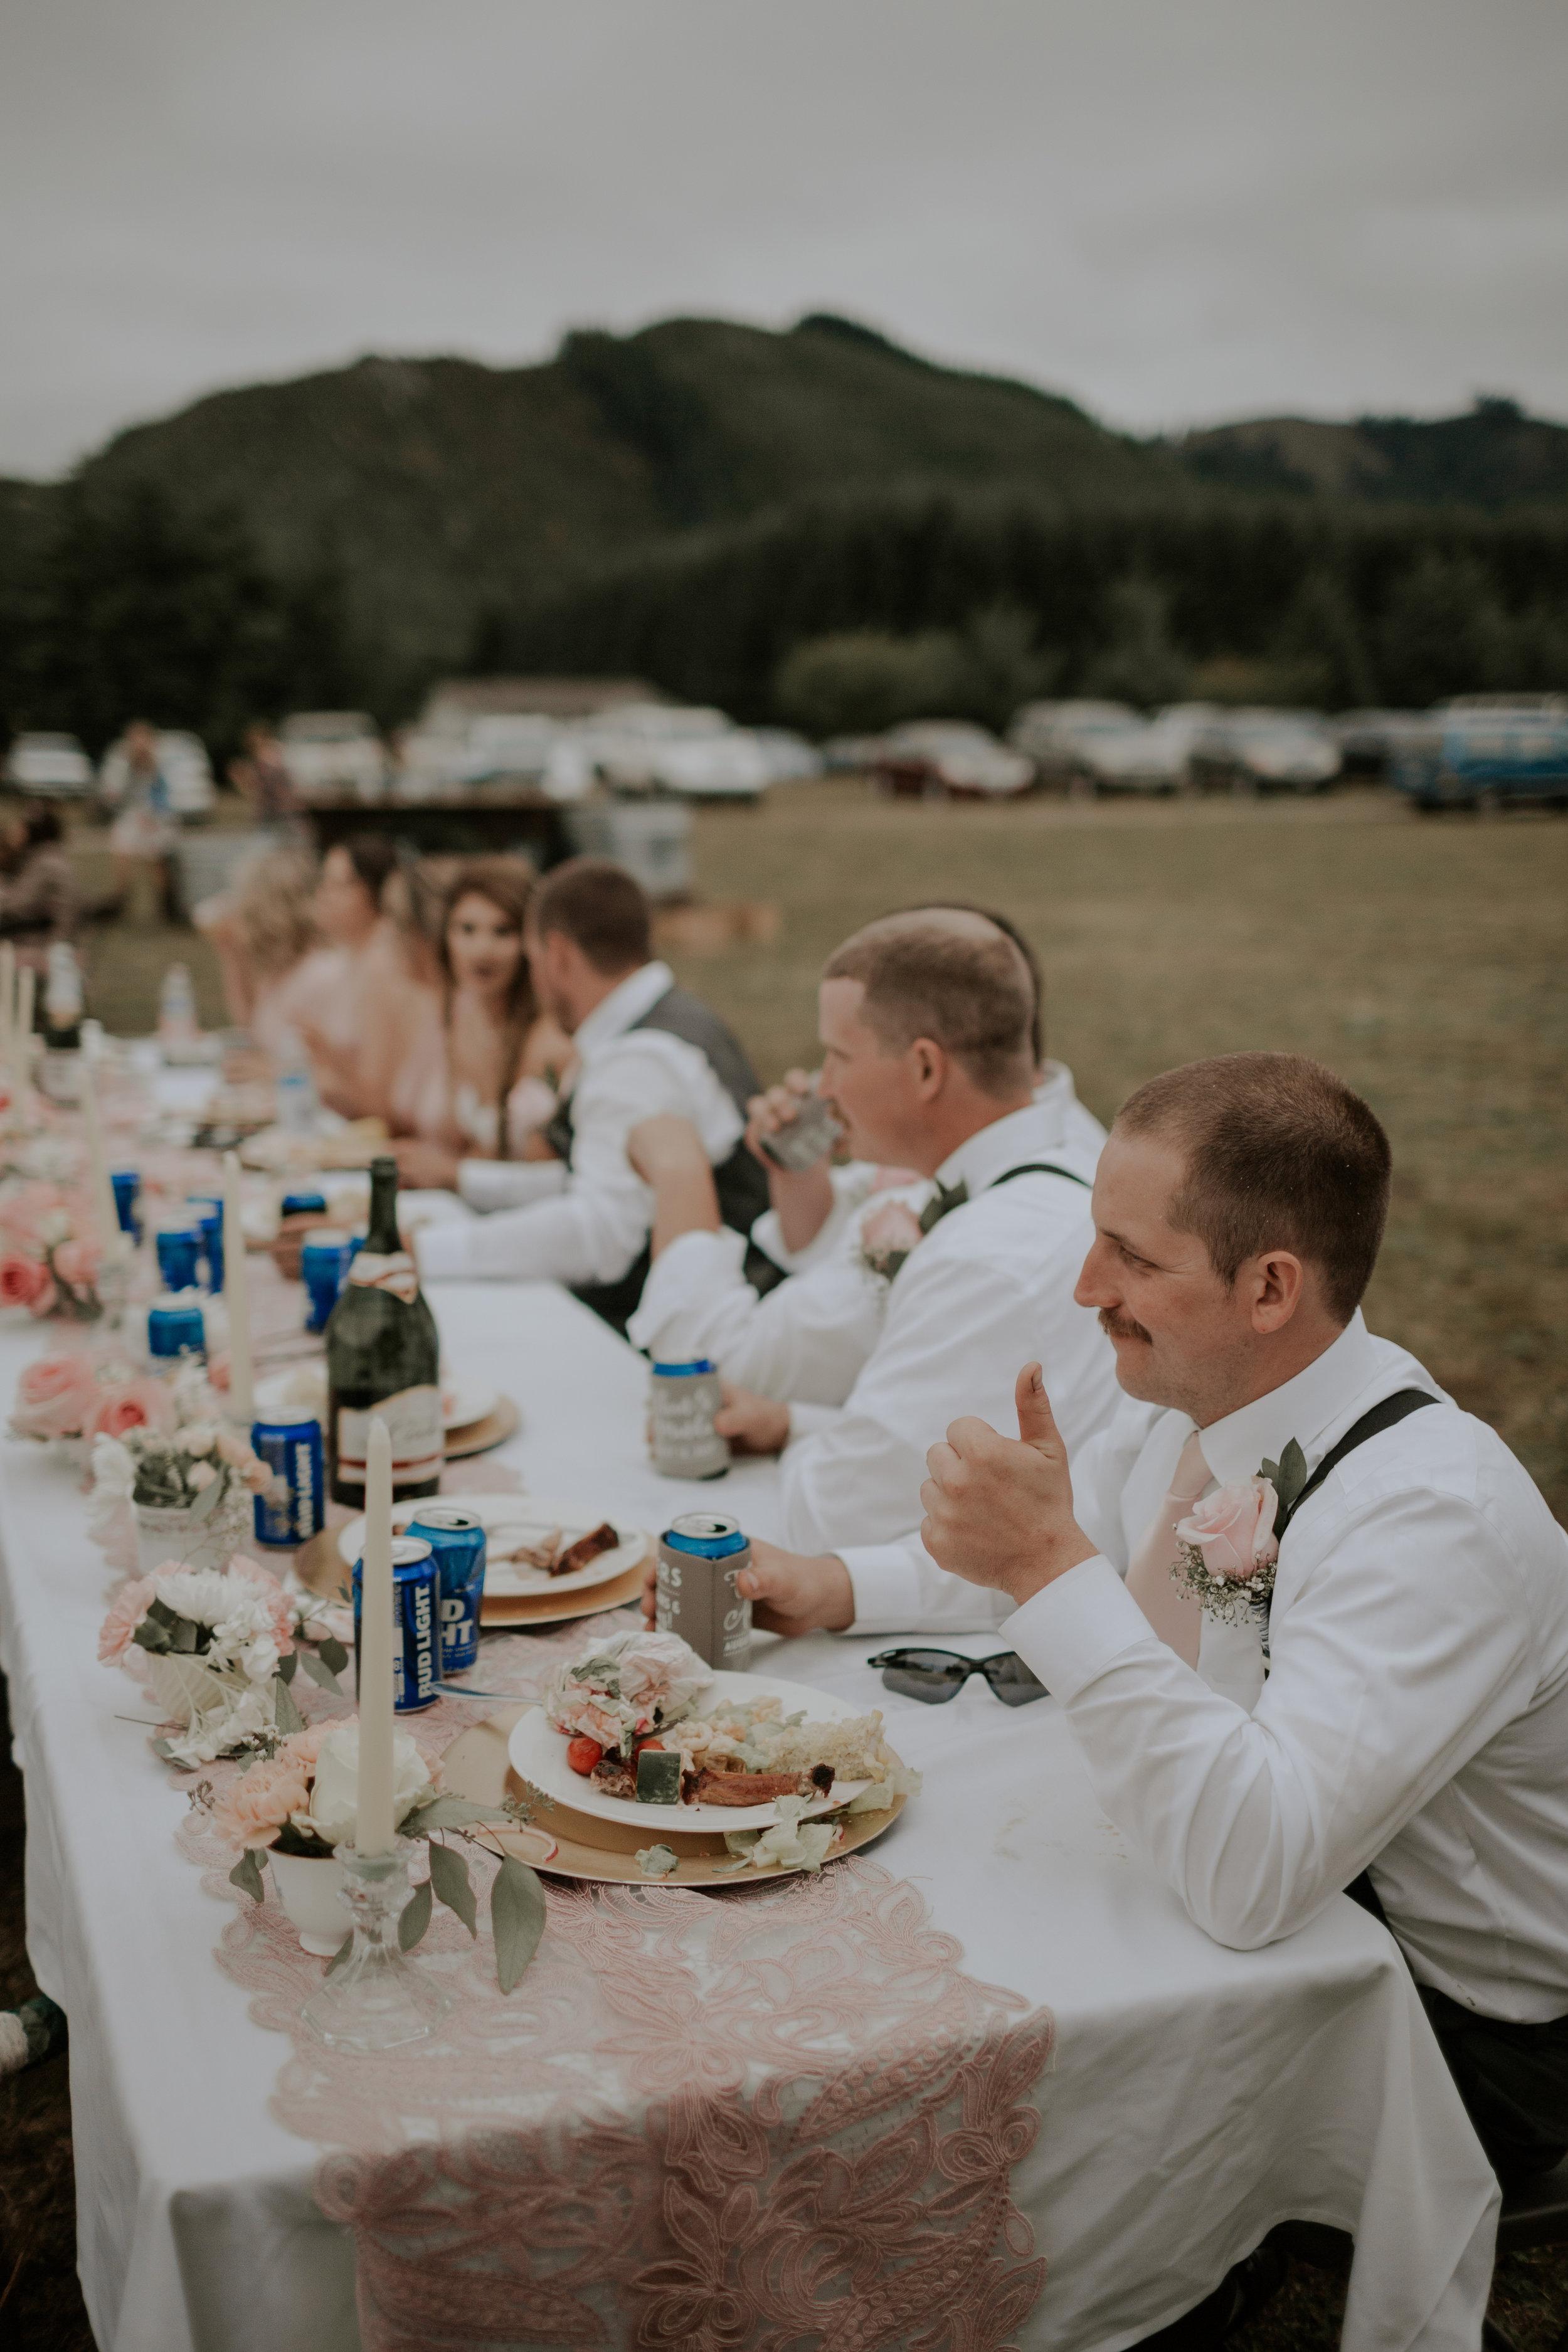 Olympic-Peninsula-Wedding-Photographer-PNW-Forks-Port-Angeles-Kayla-Dawn-Photography-engagement-Olympic-National-Park-223.jpg